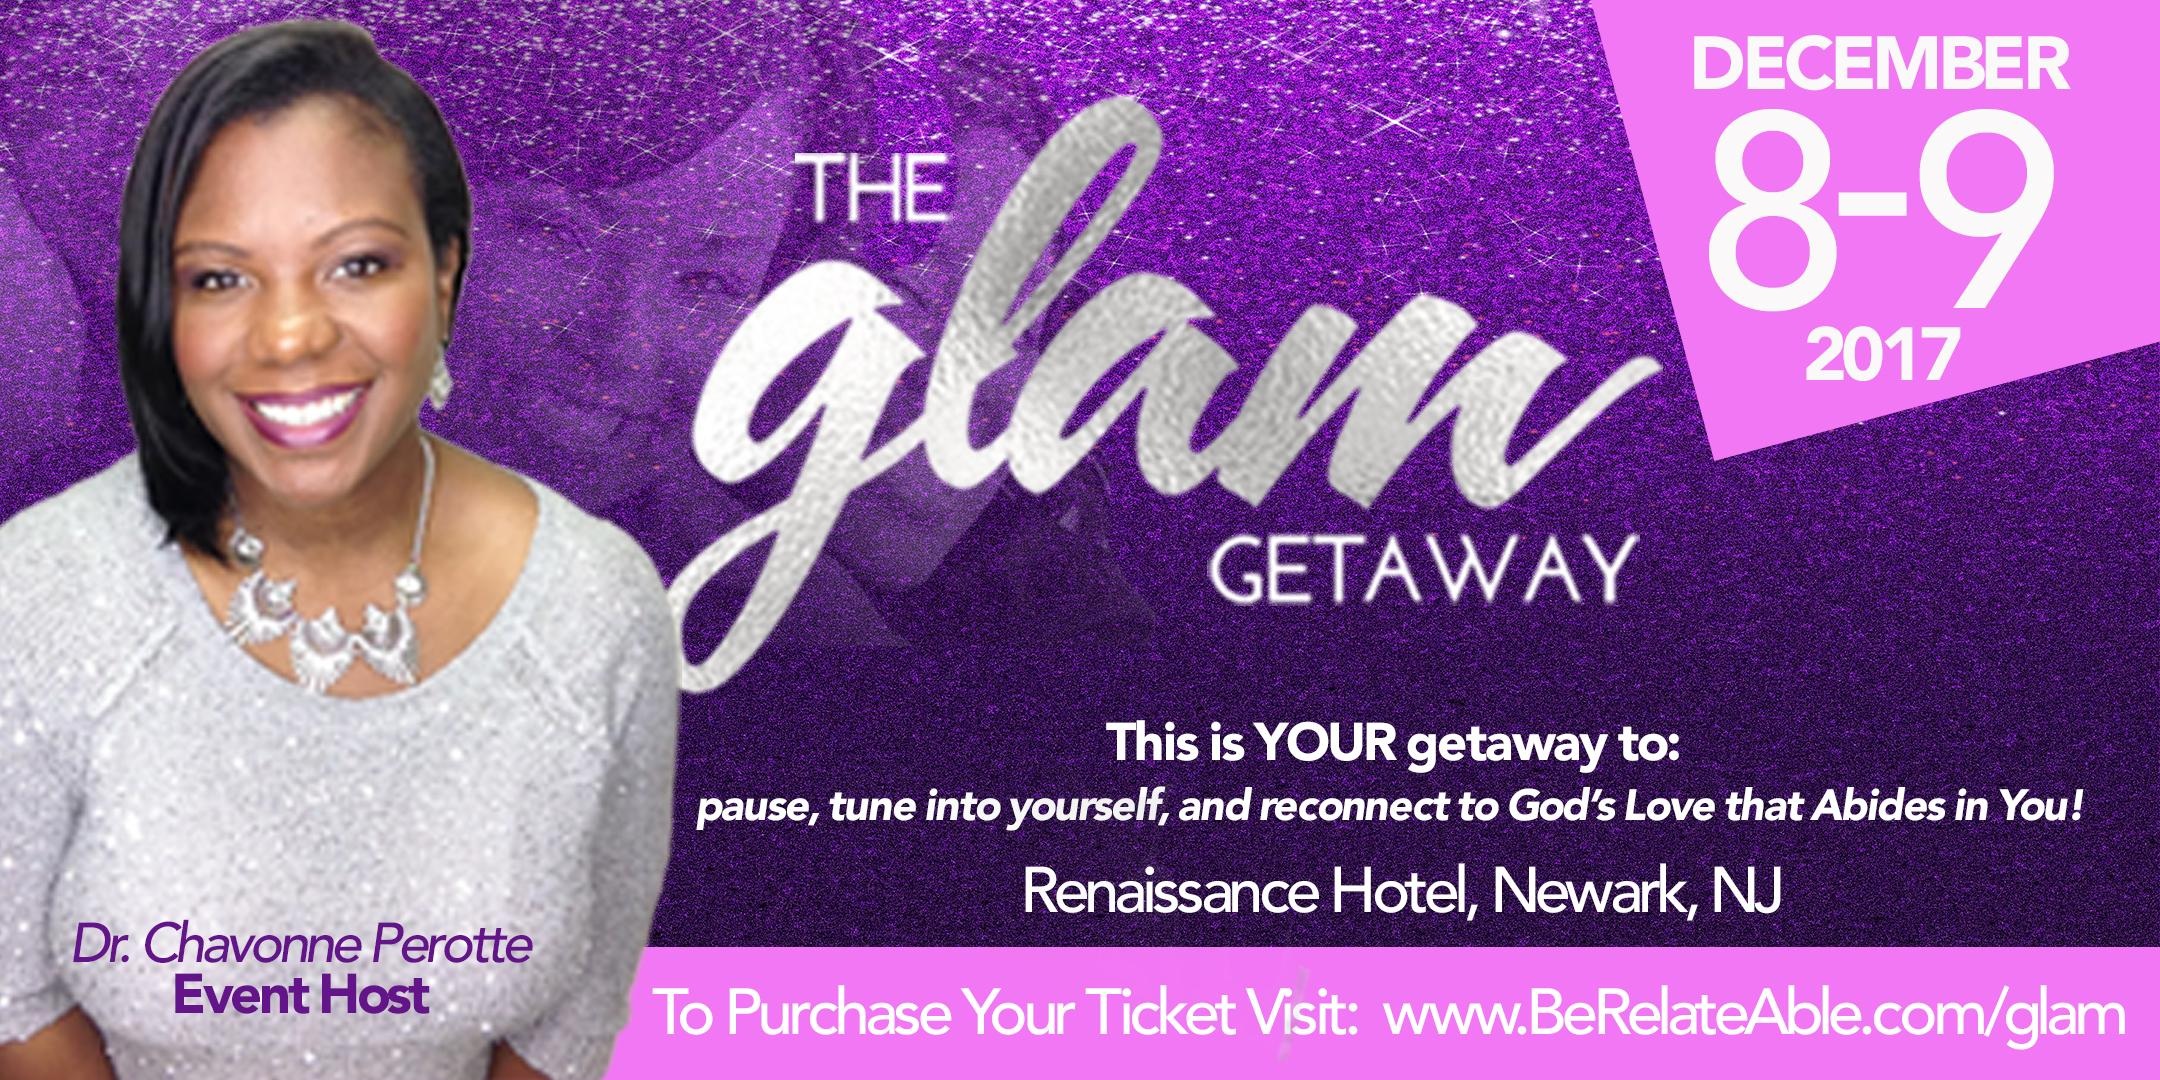 The GLAM Getaway